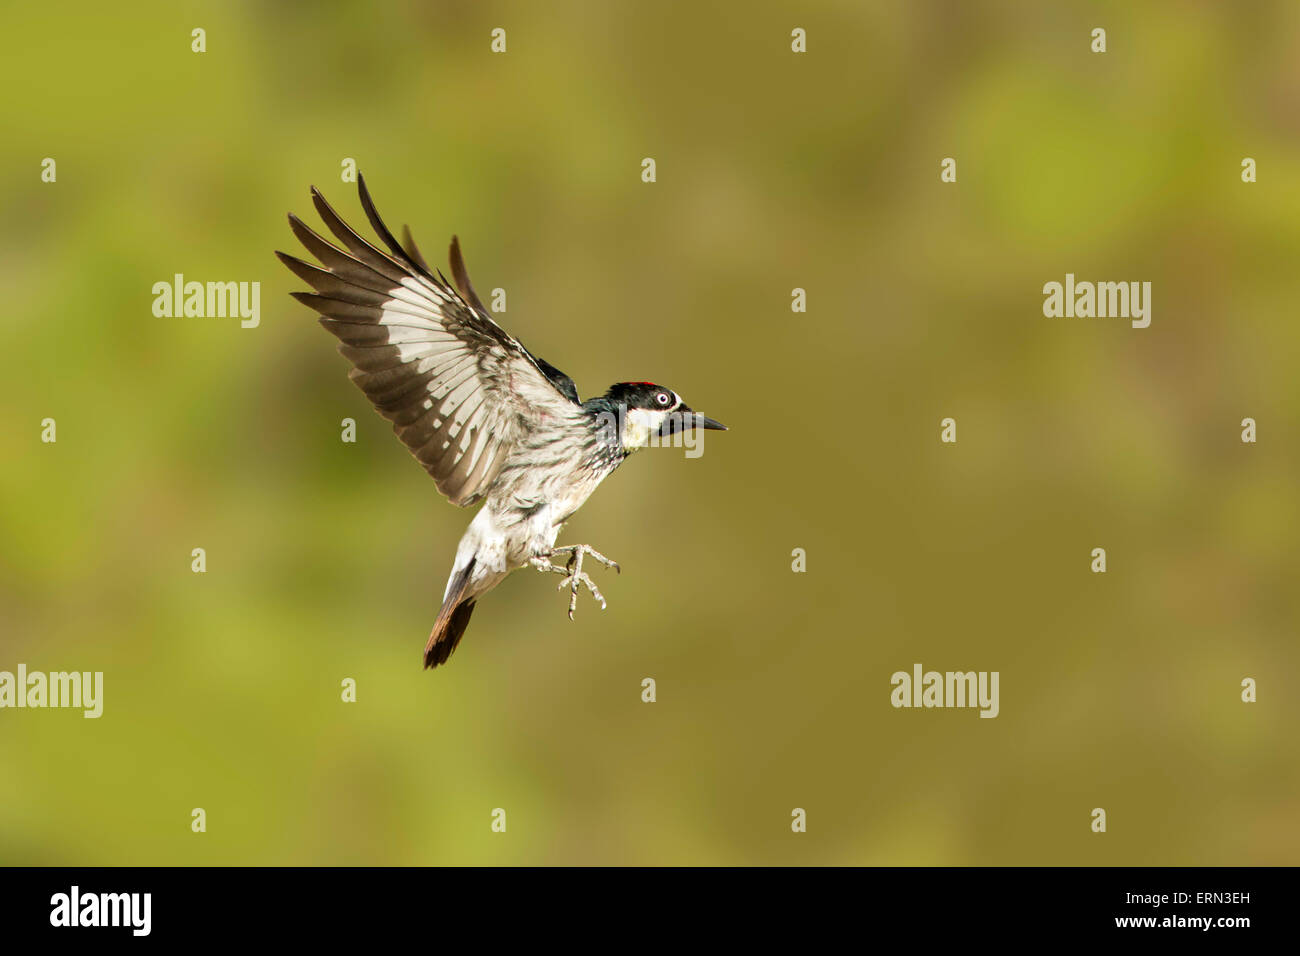 Acorn Woodpecker Melanerpes formicivorus Santa Rita Mountains, Santa Cruz County, Arizona, United States 23 May - Stock Image